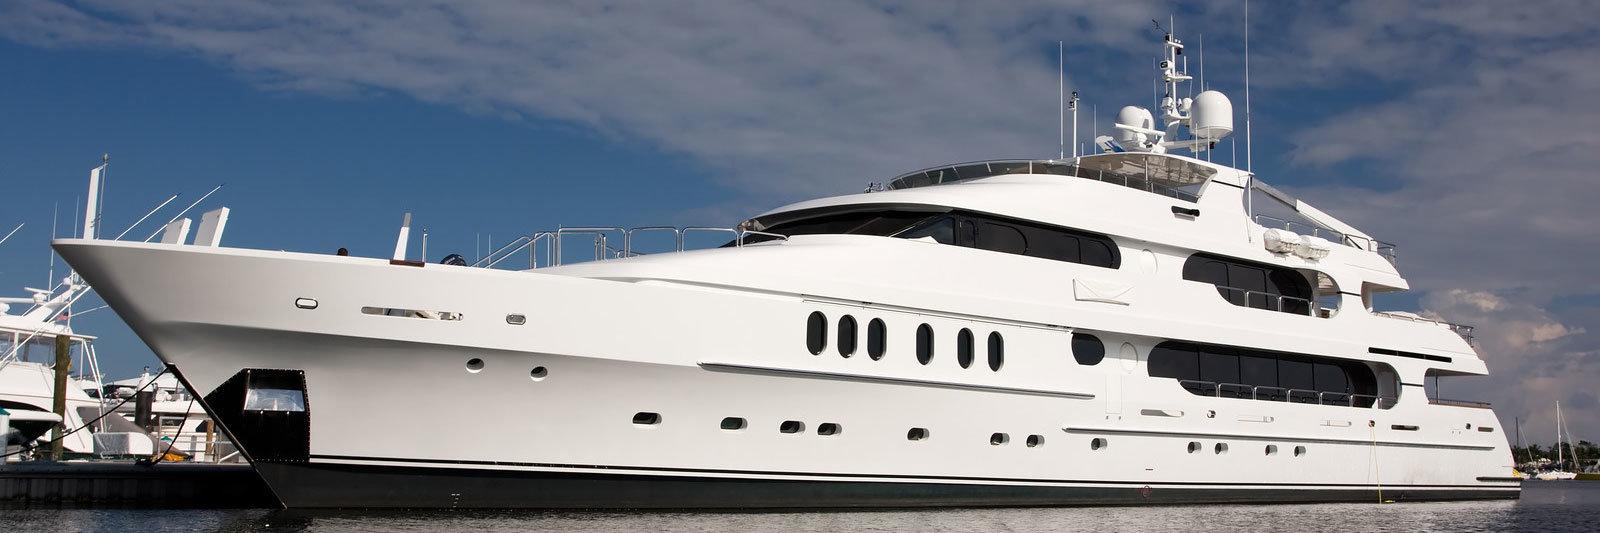 Luxury Yacht AV installation